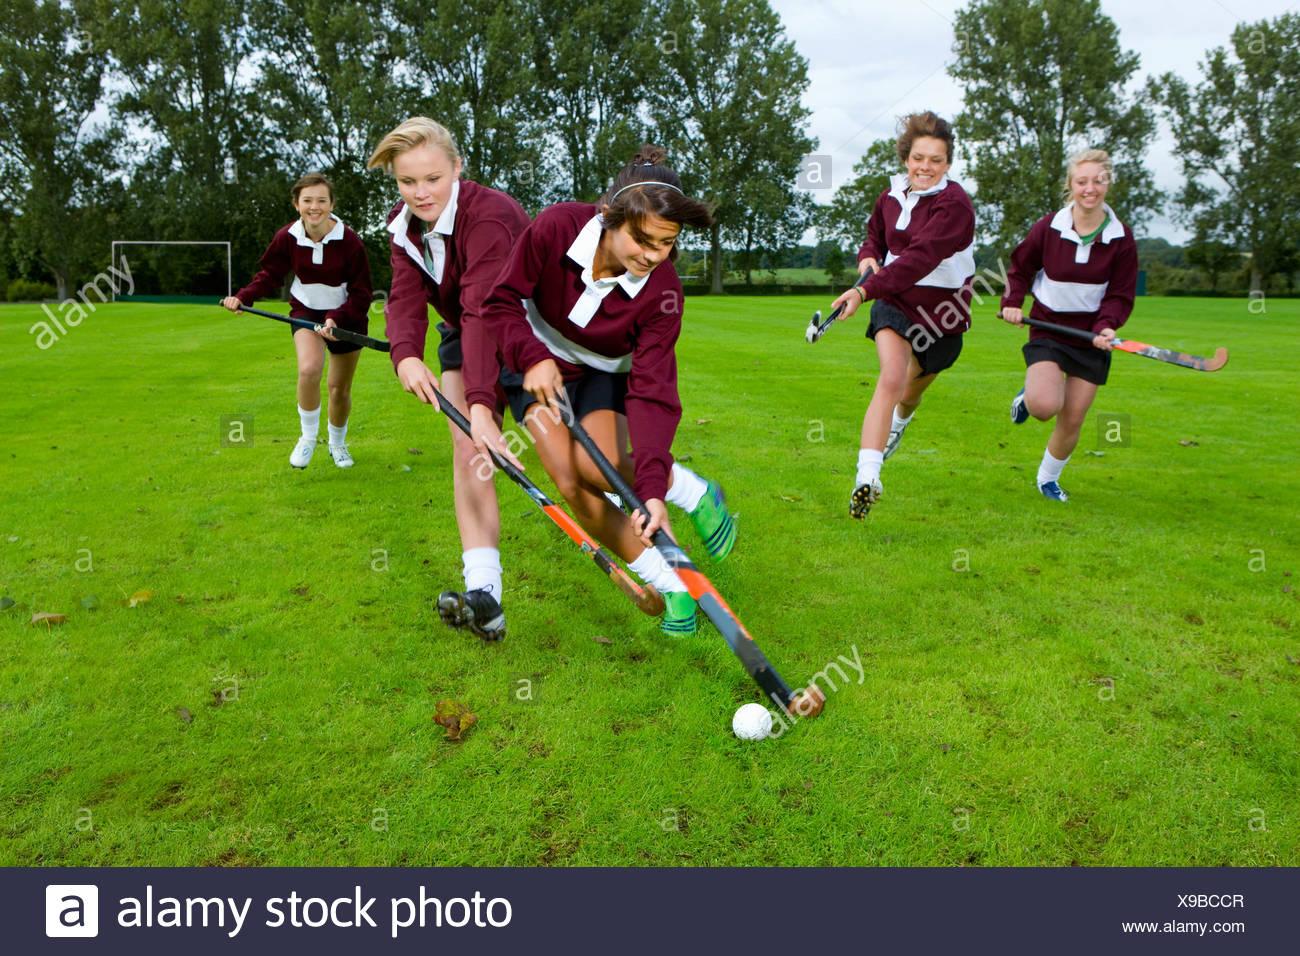 Teenage Girls playing field hockey Photo Stock